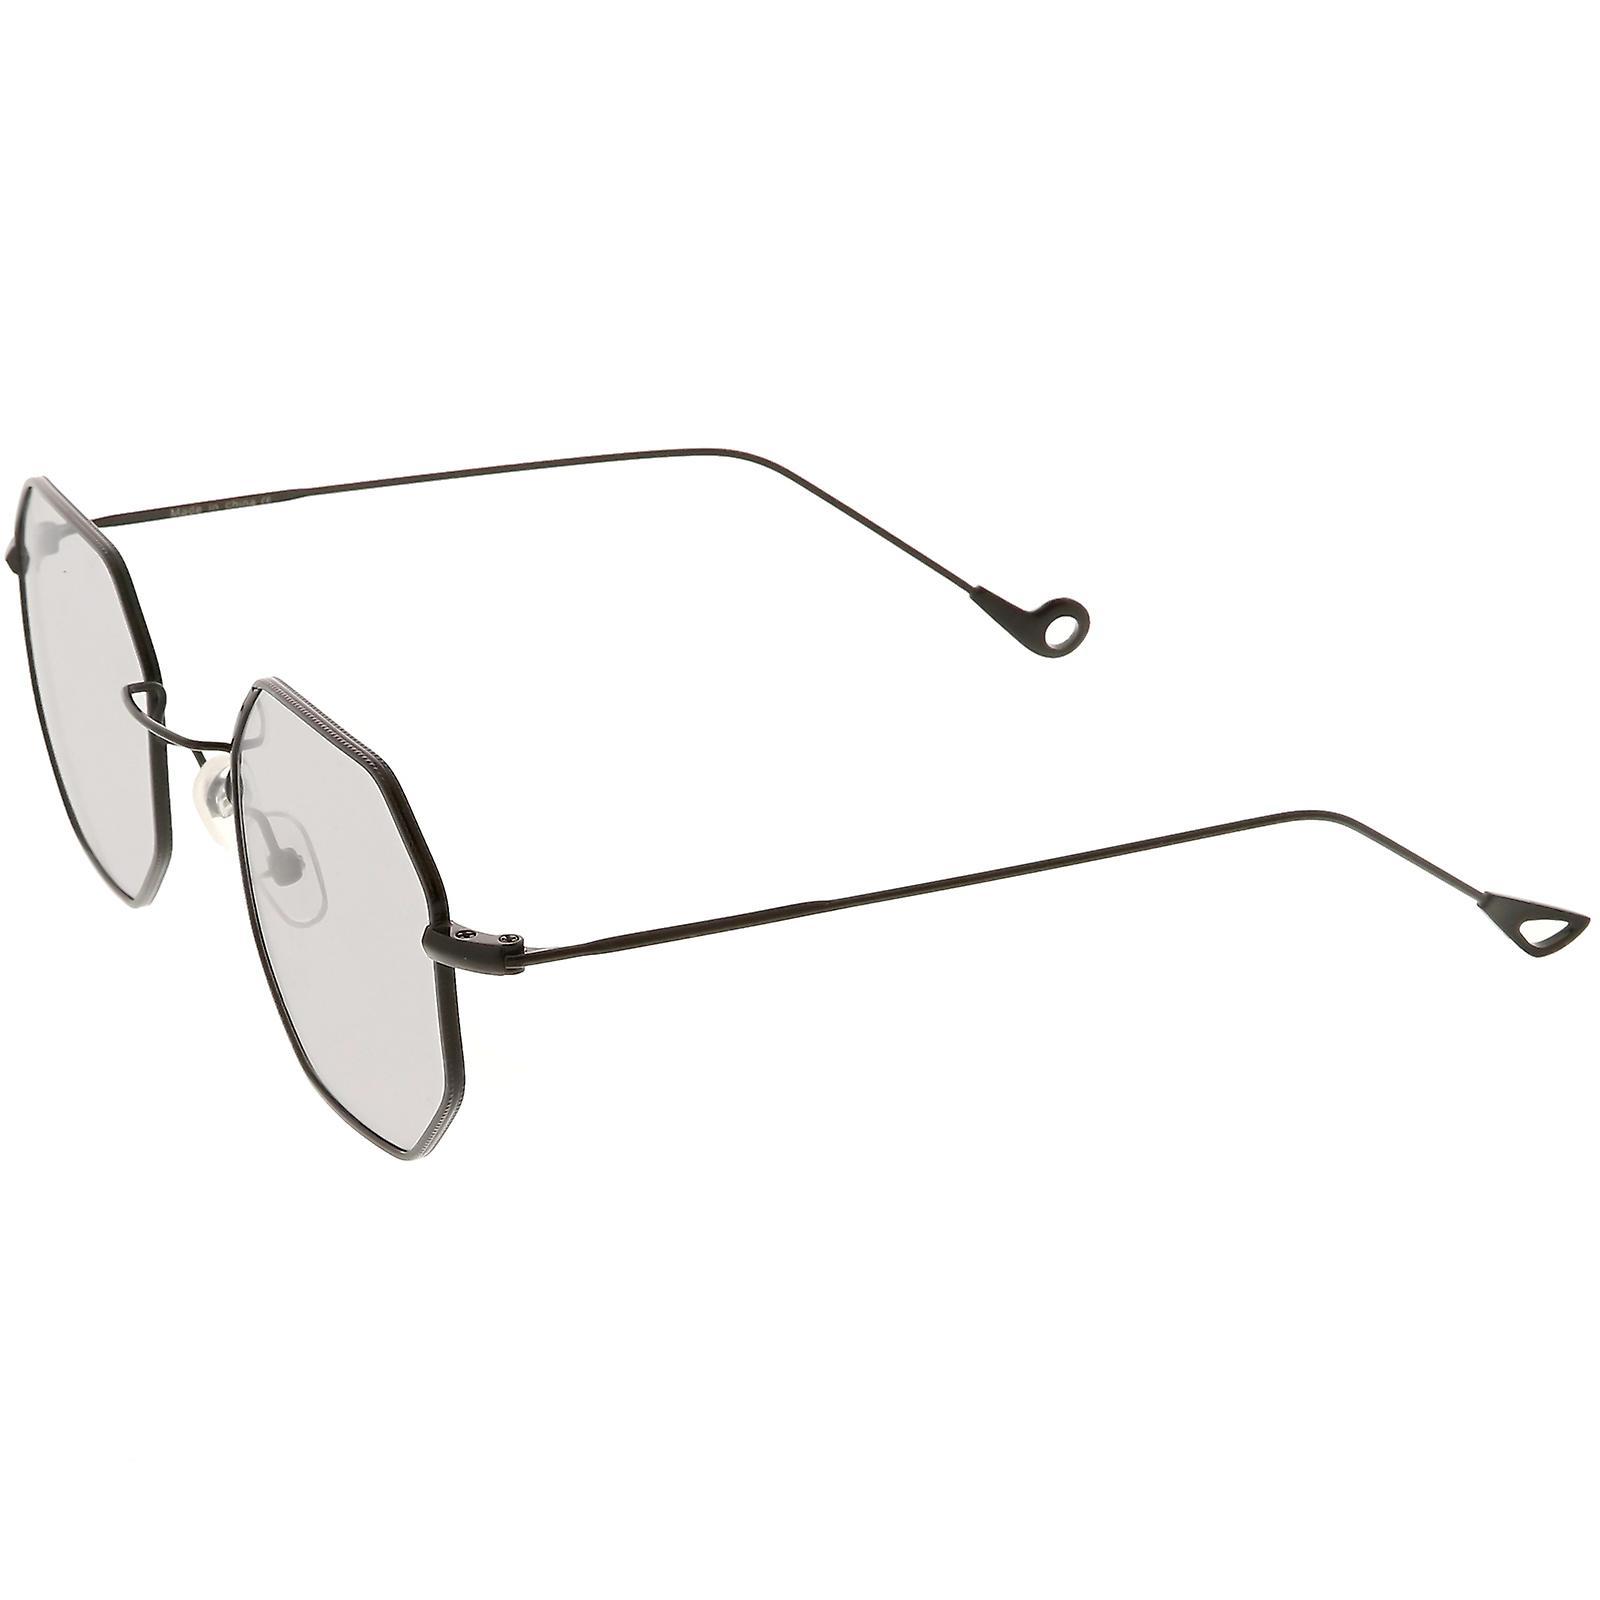 f10da6aaf6 Premium Geometric Octagon Sunglasses Ultra Slim Metal Color Tinted Flat  Lens 49mm